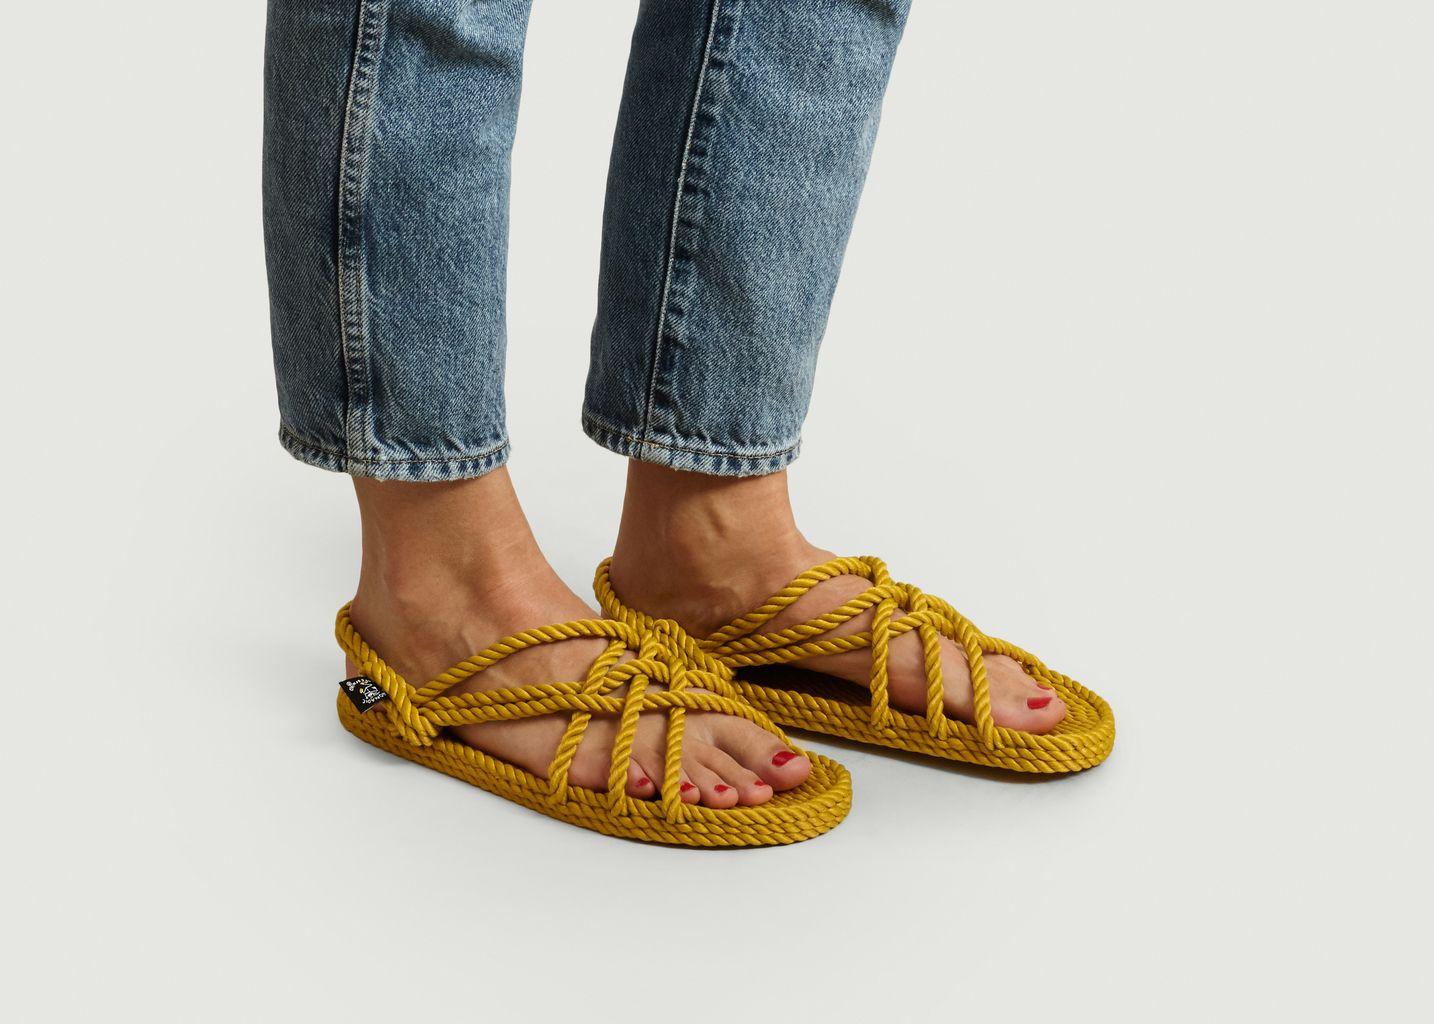 Sandales Toe Joe - Nomadic State of mind